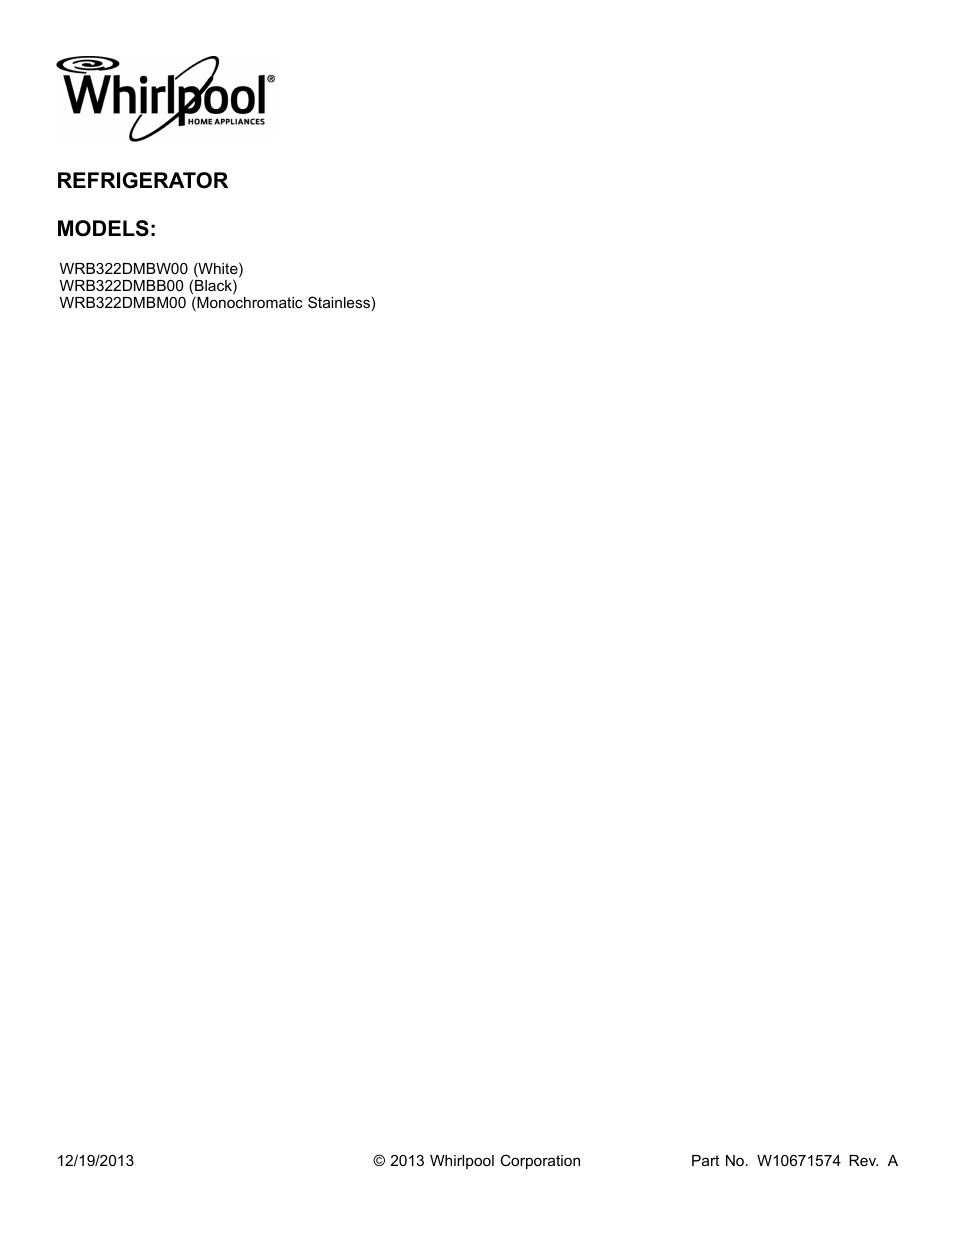 Whirlpool Refrigerator Schematic Diagram